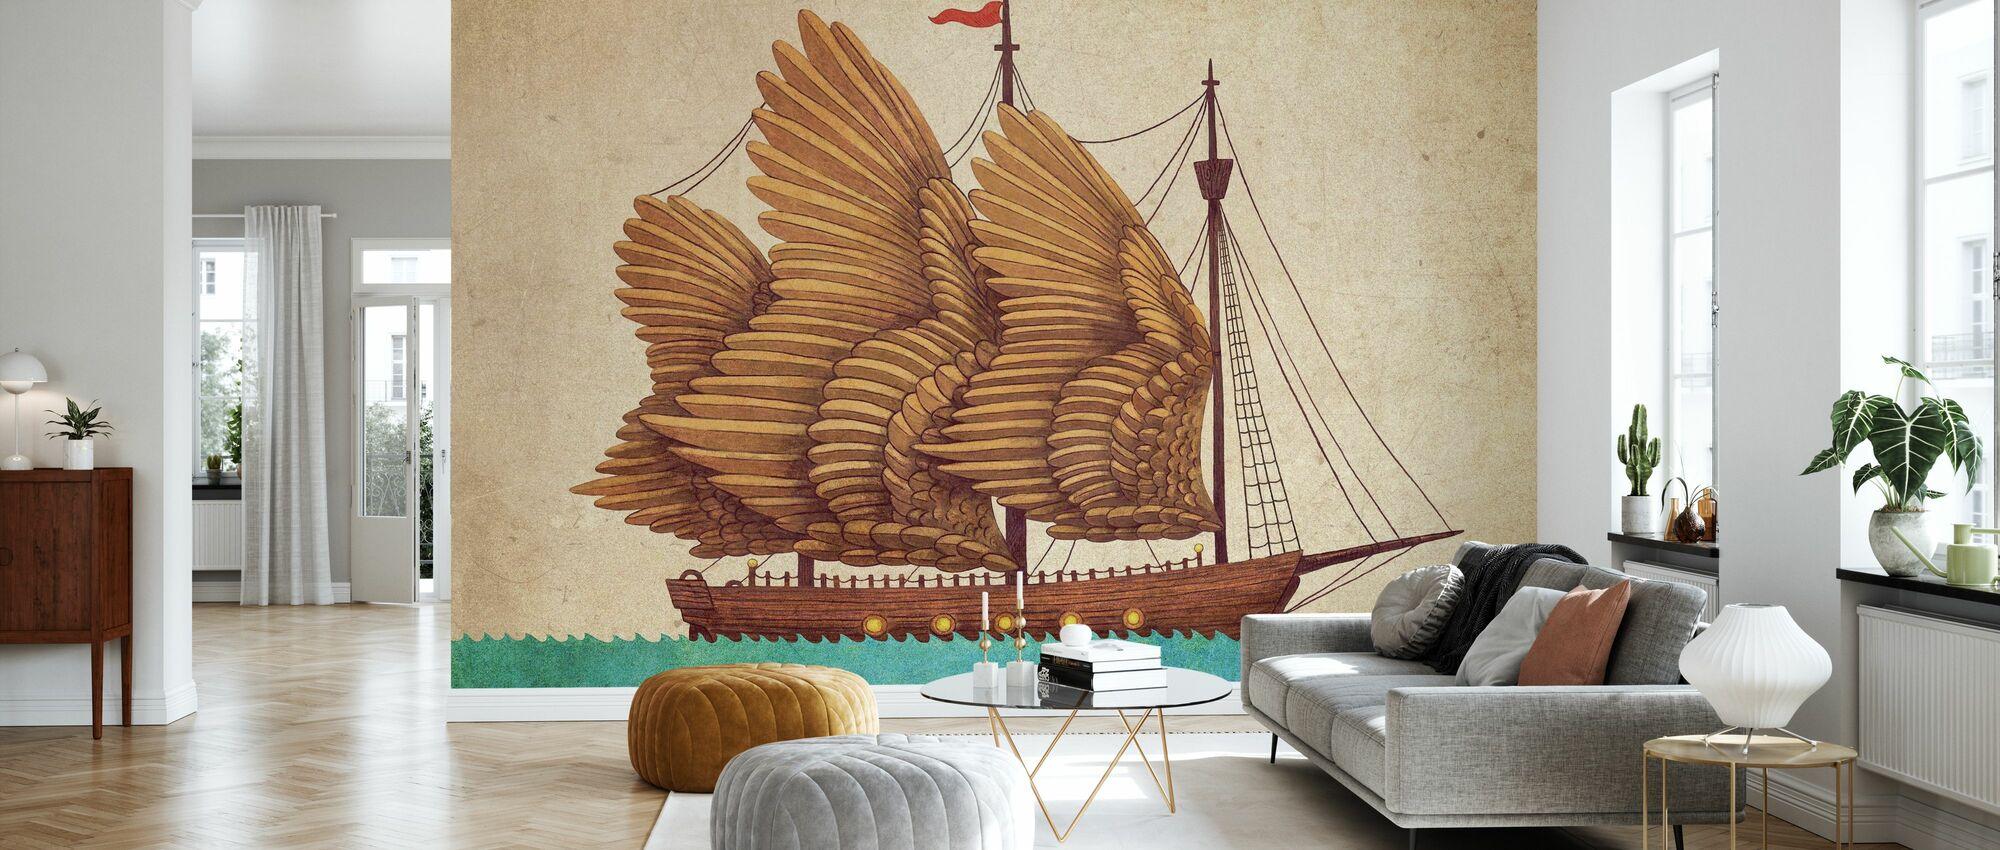 Winged Odyssey - Wallpaper - Living Room